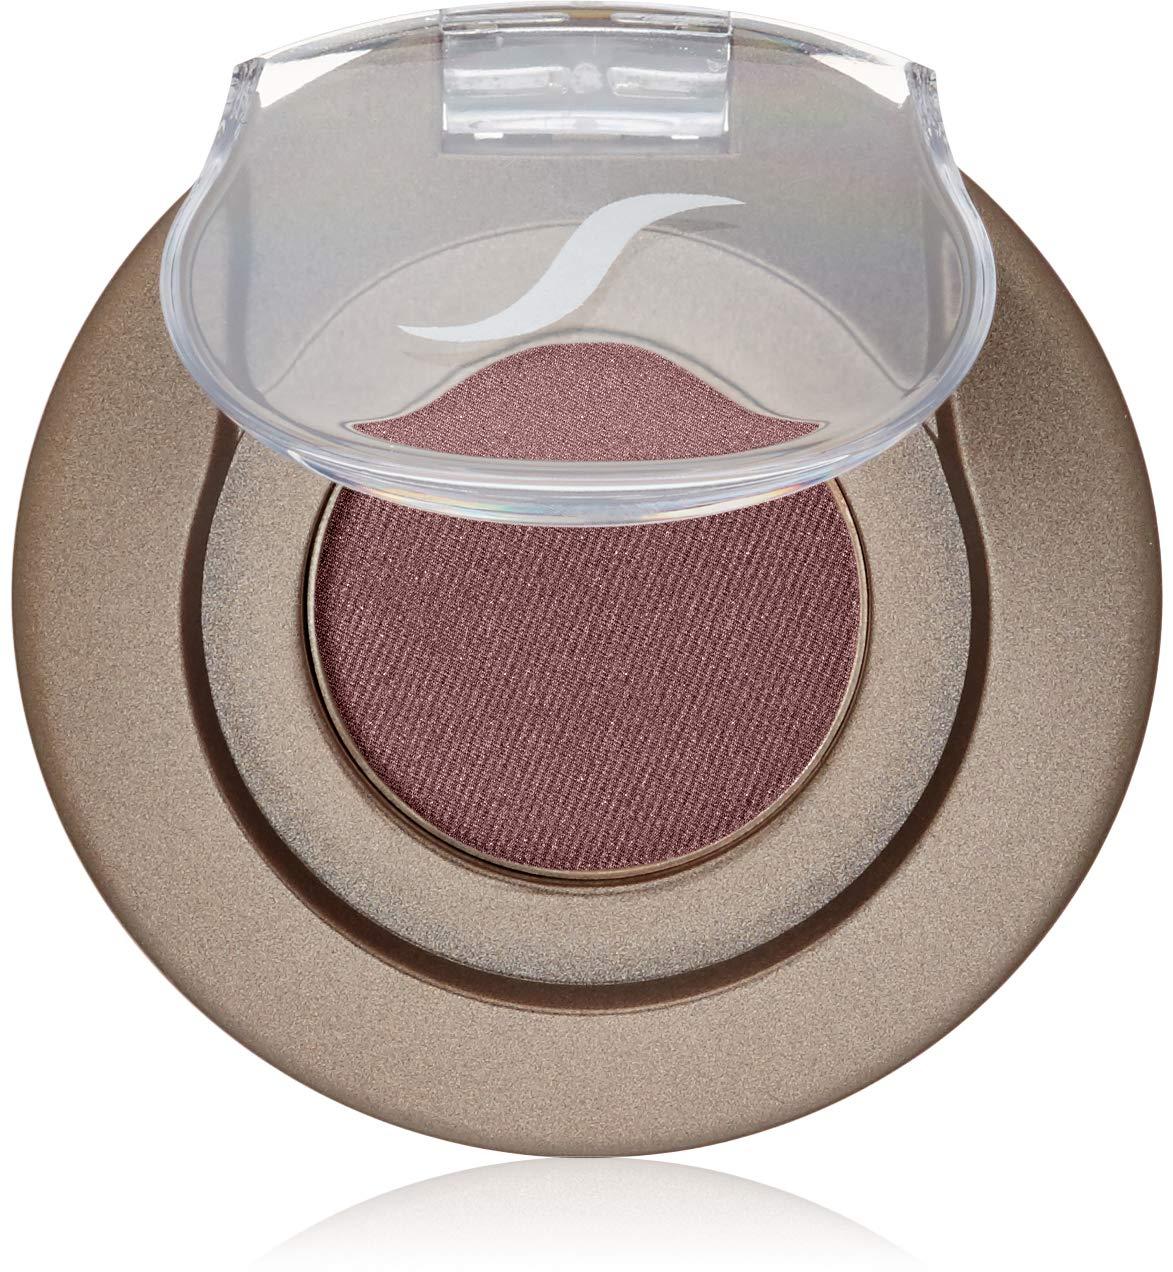 Sorme' Treatment Cosmetics Mineral Botanicals Eye Shadow, Exotica